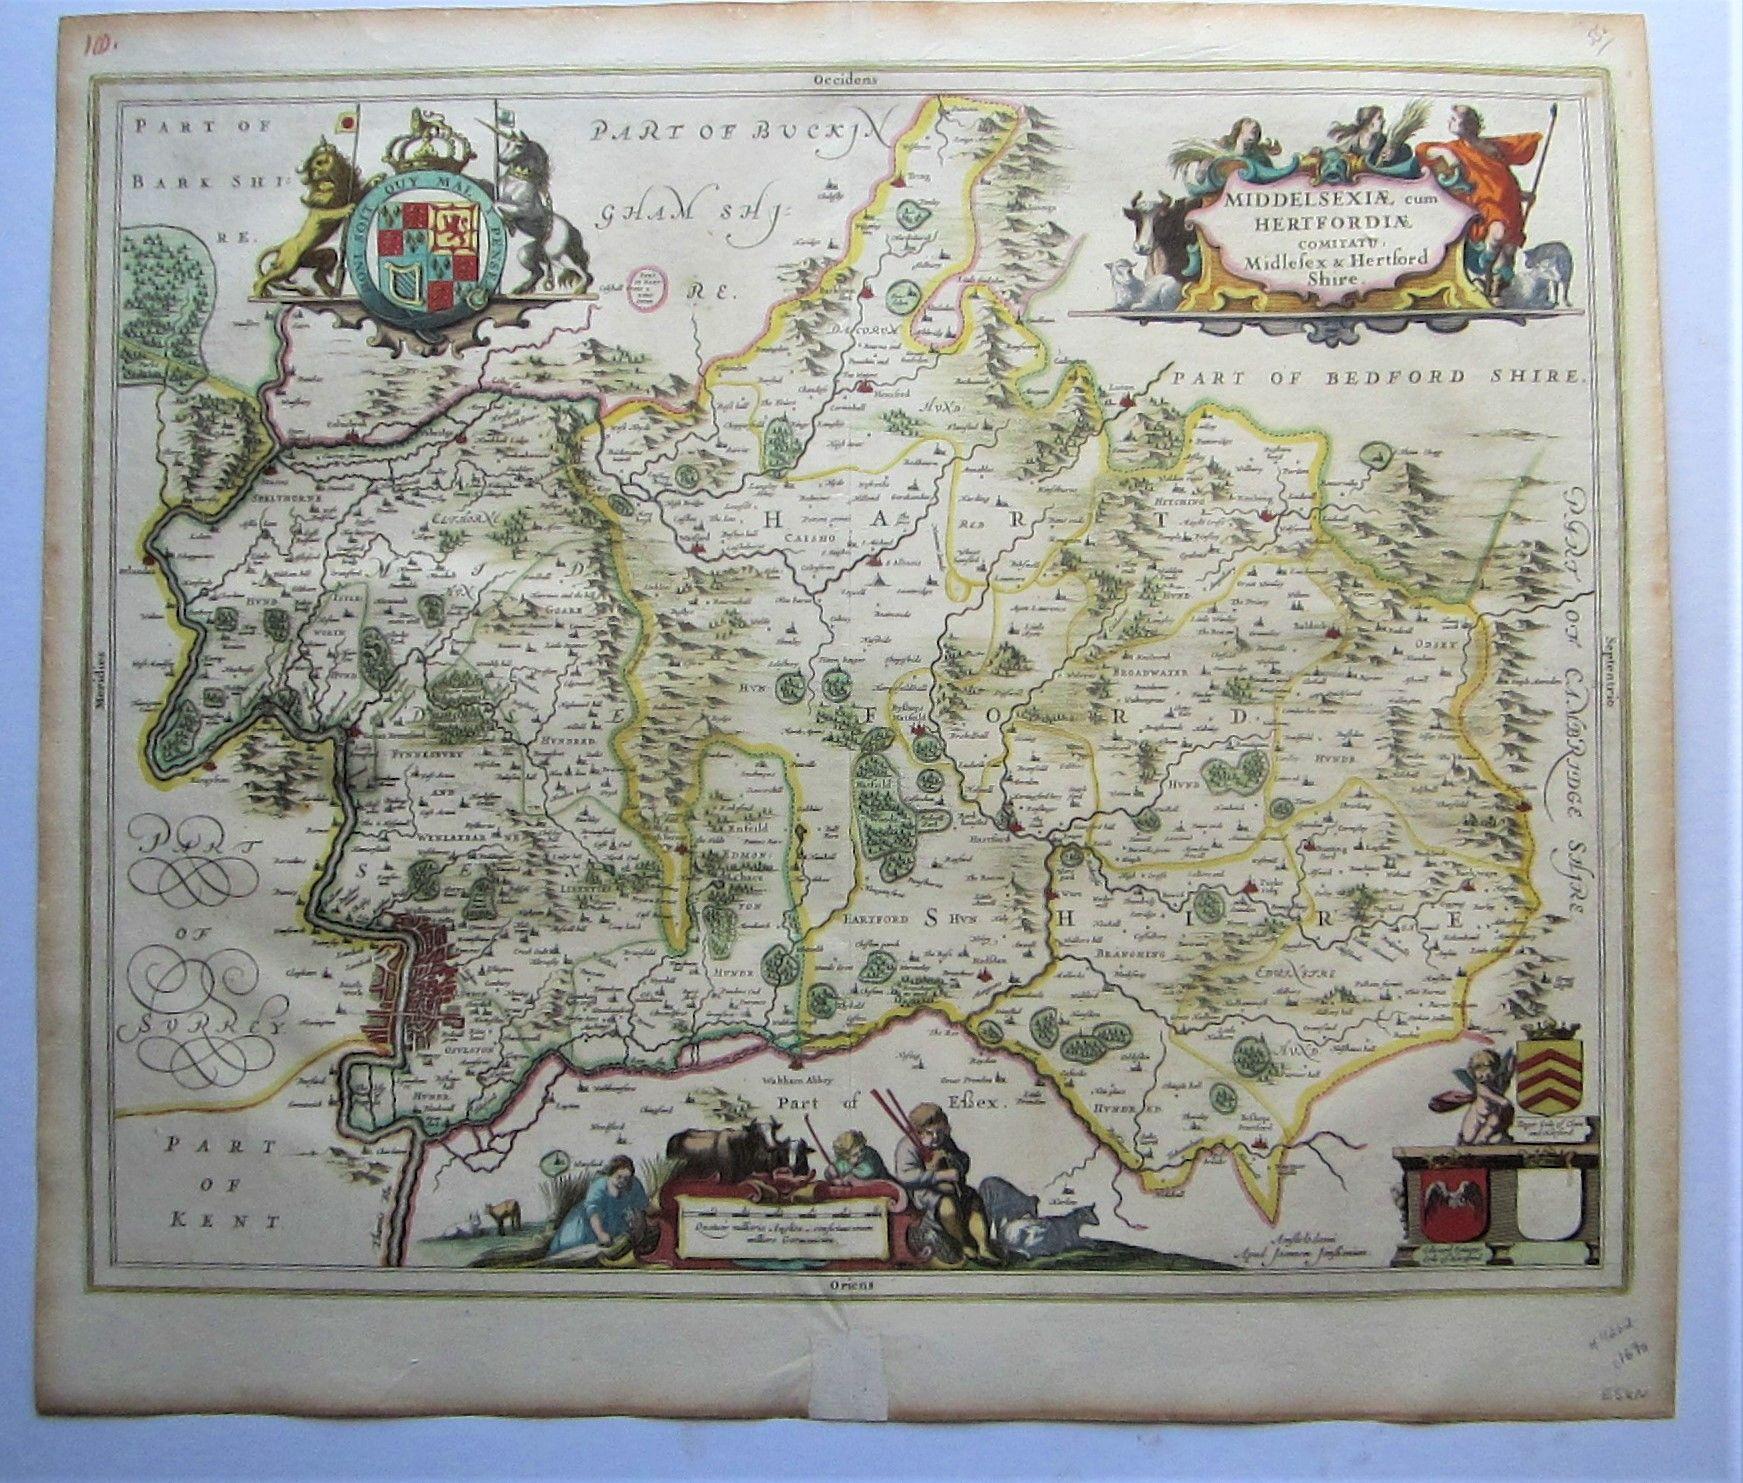 Middelsexiae cum Hertfordiae comitatu: Midlesex & Hertford Shire (photo 1)